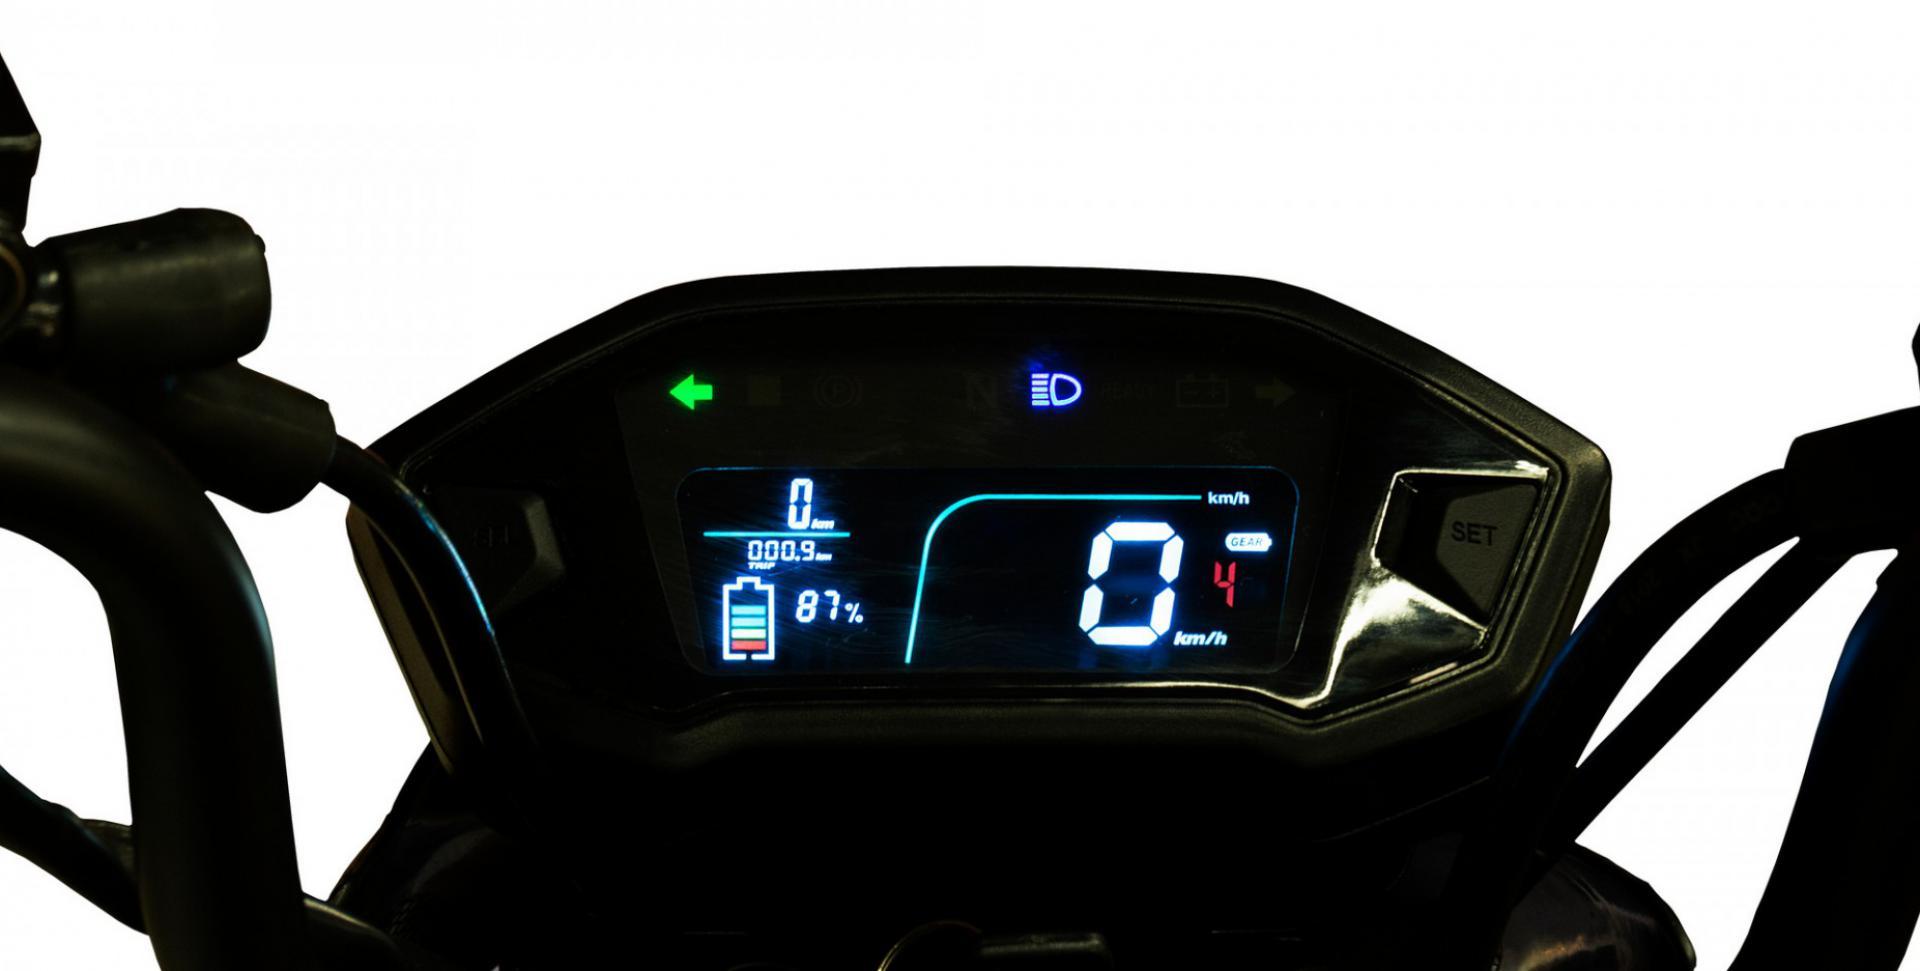 E-Mio-Vento-detail-speedometer01.jpg